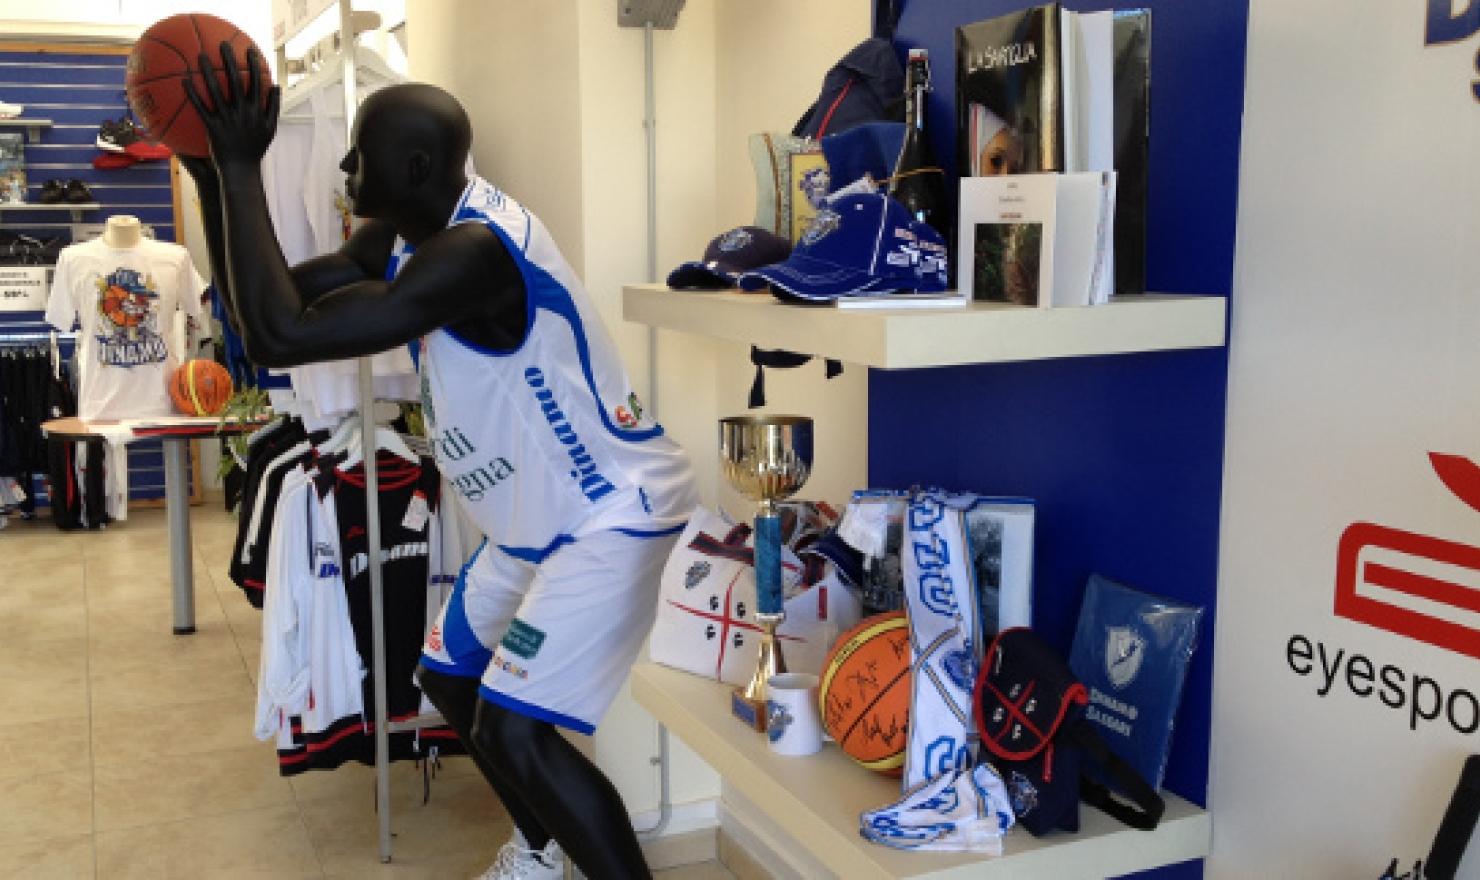 mercatino piazzale segni sassari basketball - photo#30